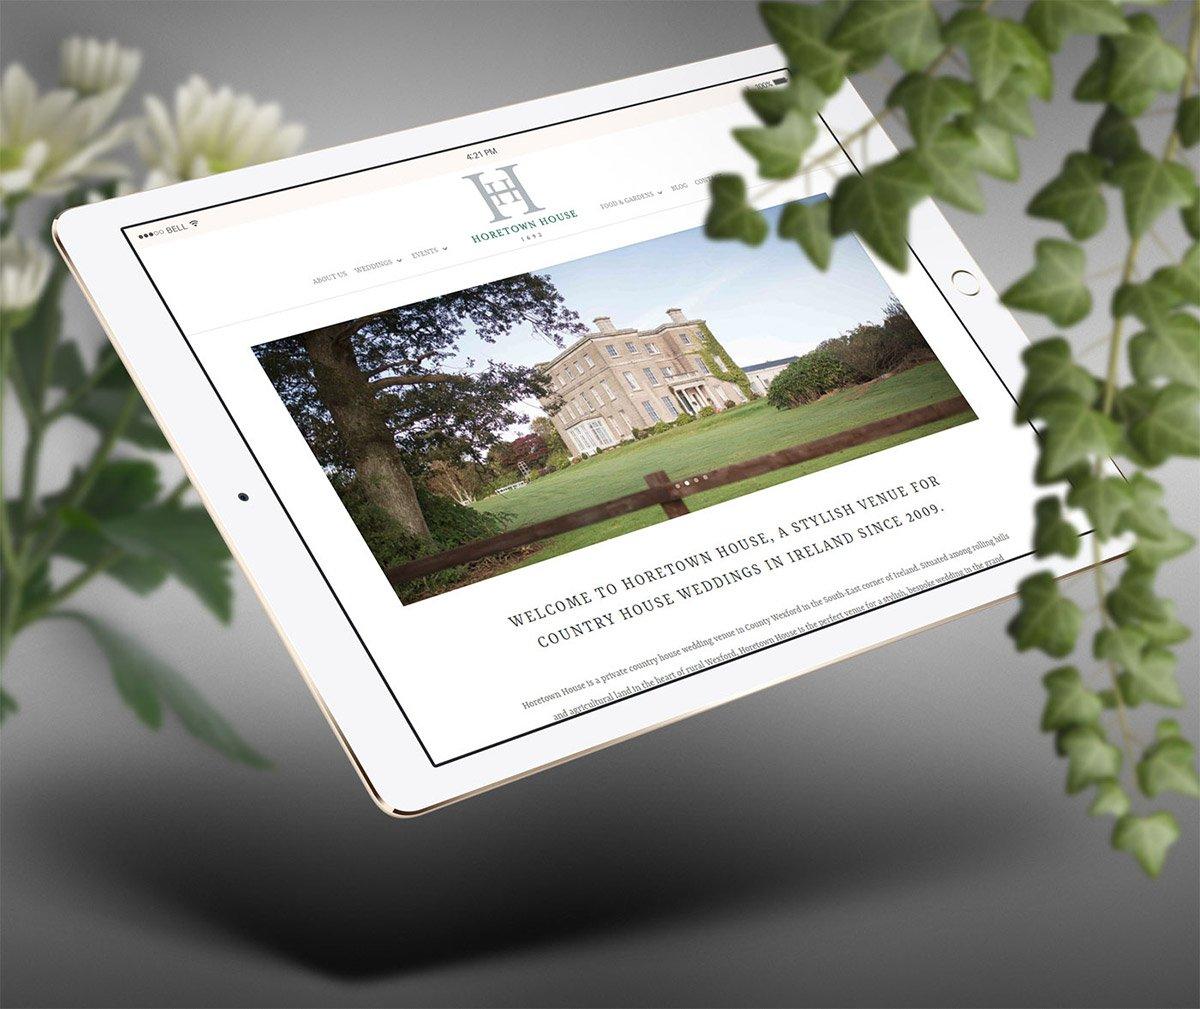 horetown house ipad landscape website design